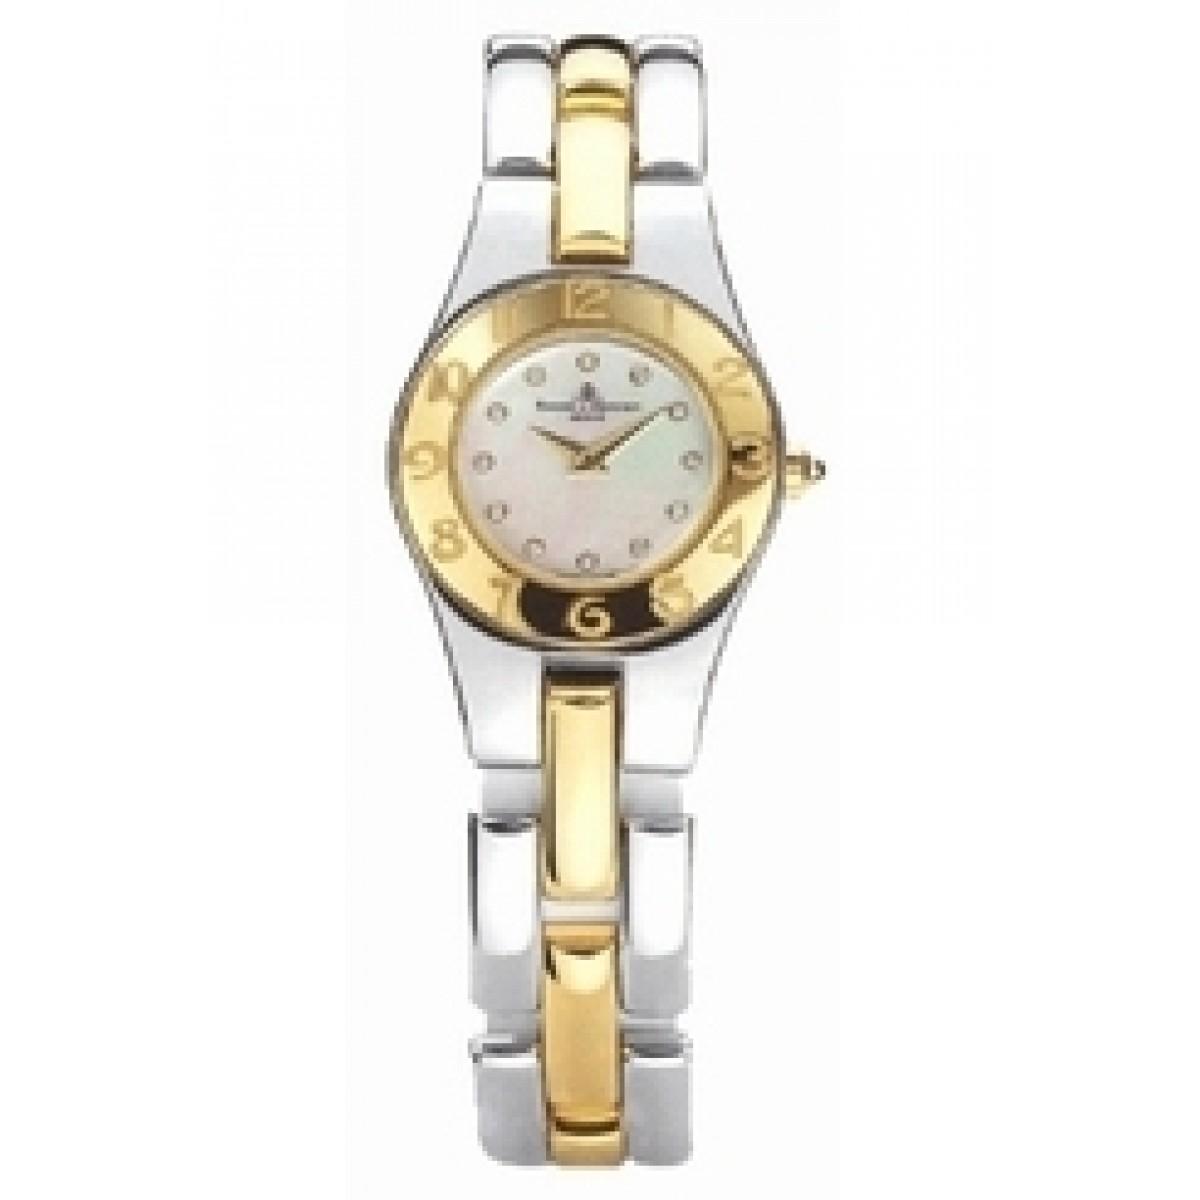 c2f7114adac Relógio Réplica Baume Mercier Ilea Misto